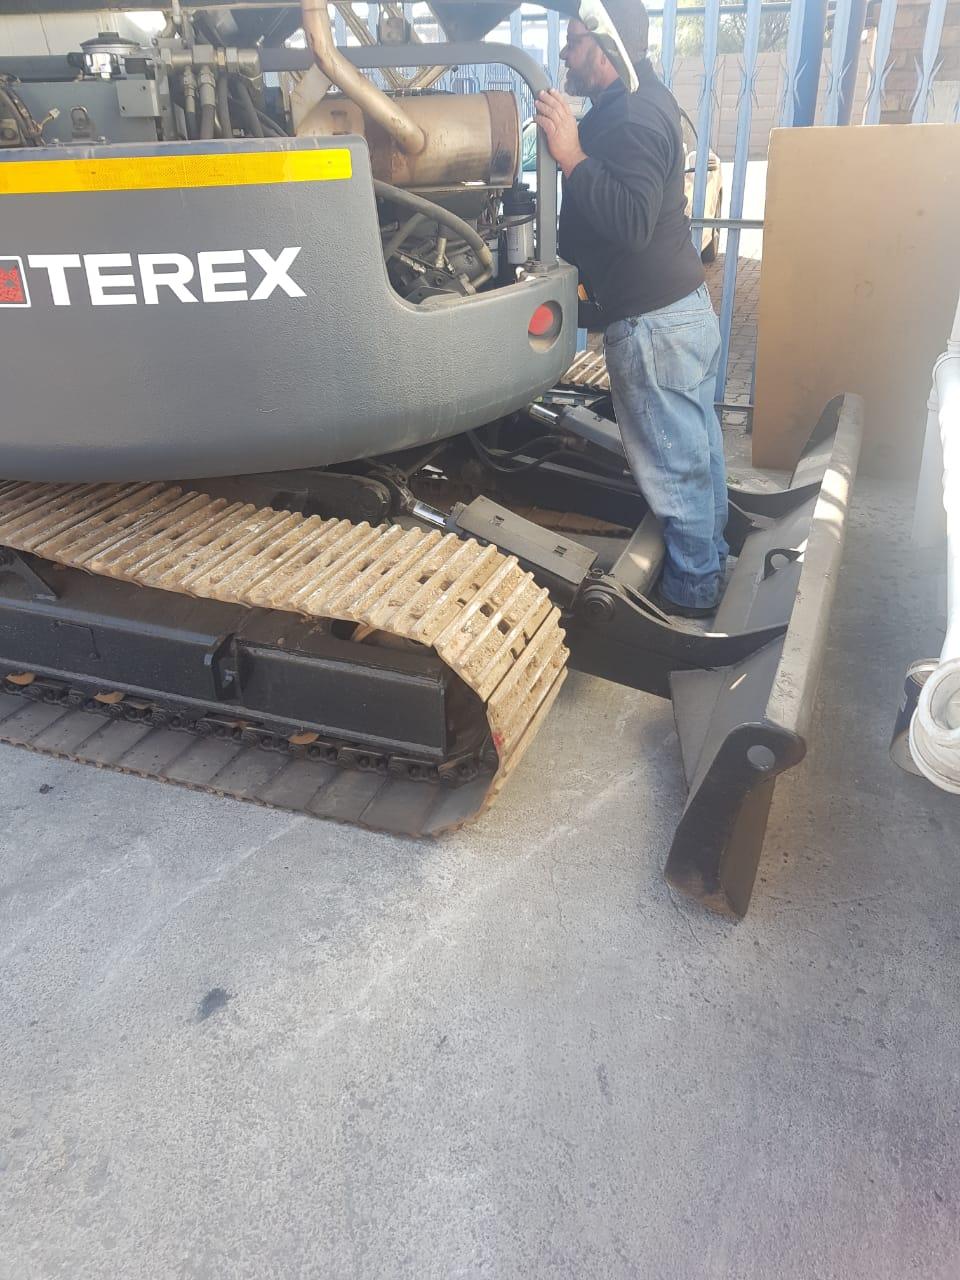 2007 Terex 7.5 ton mini excavator for sale